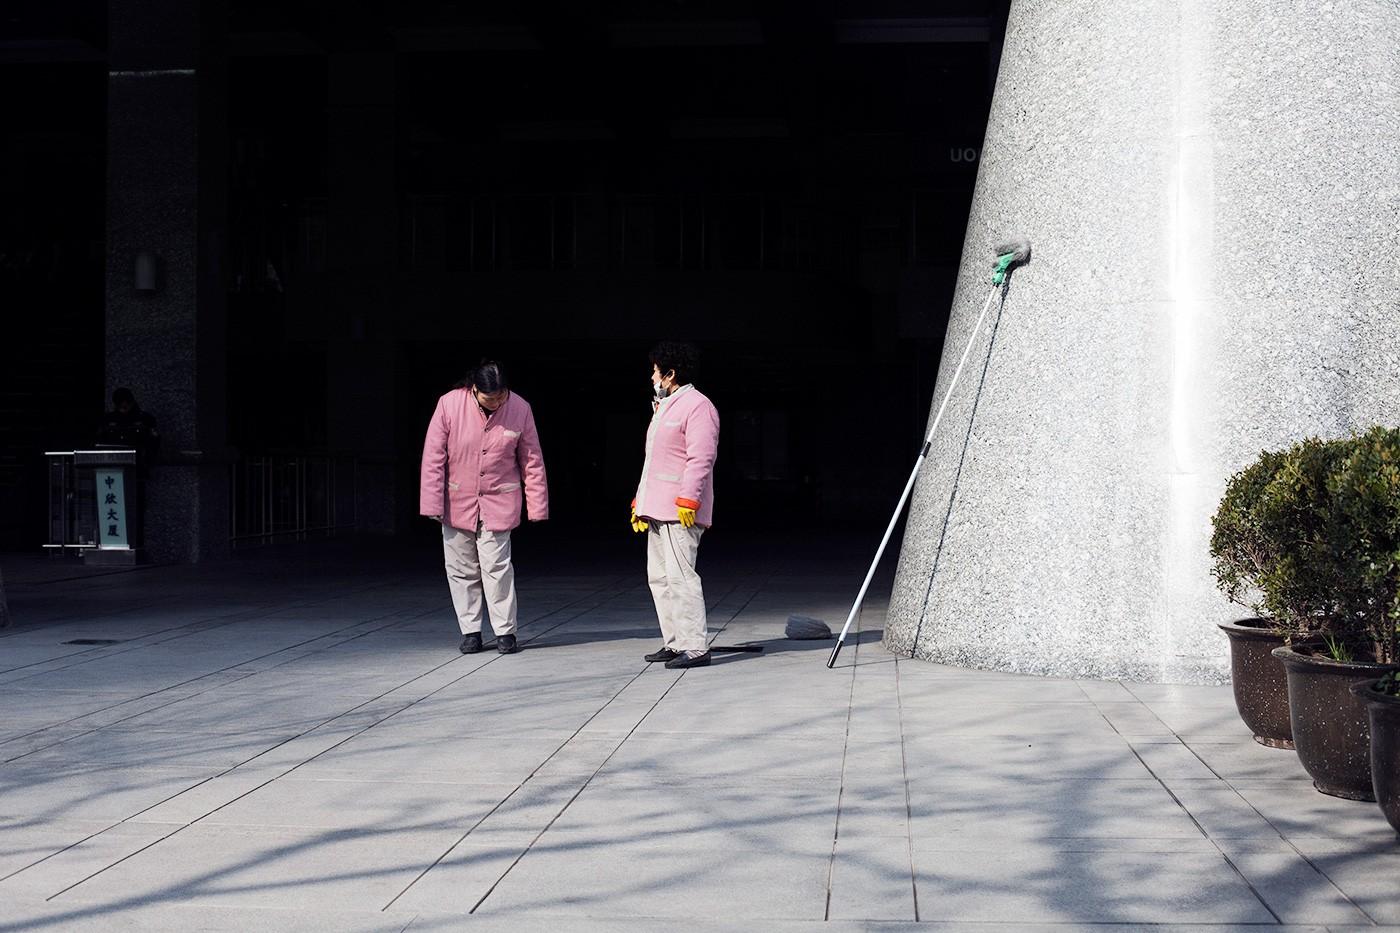 nickandchloe_shanghai_10